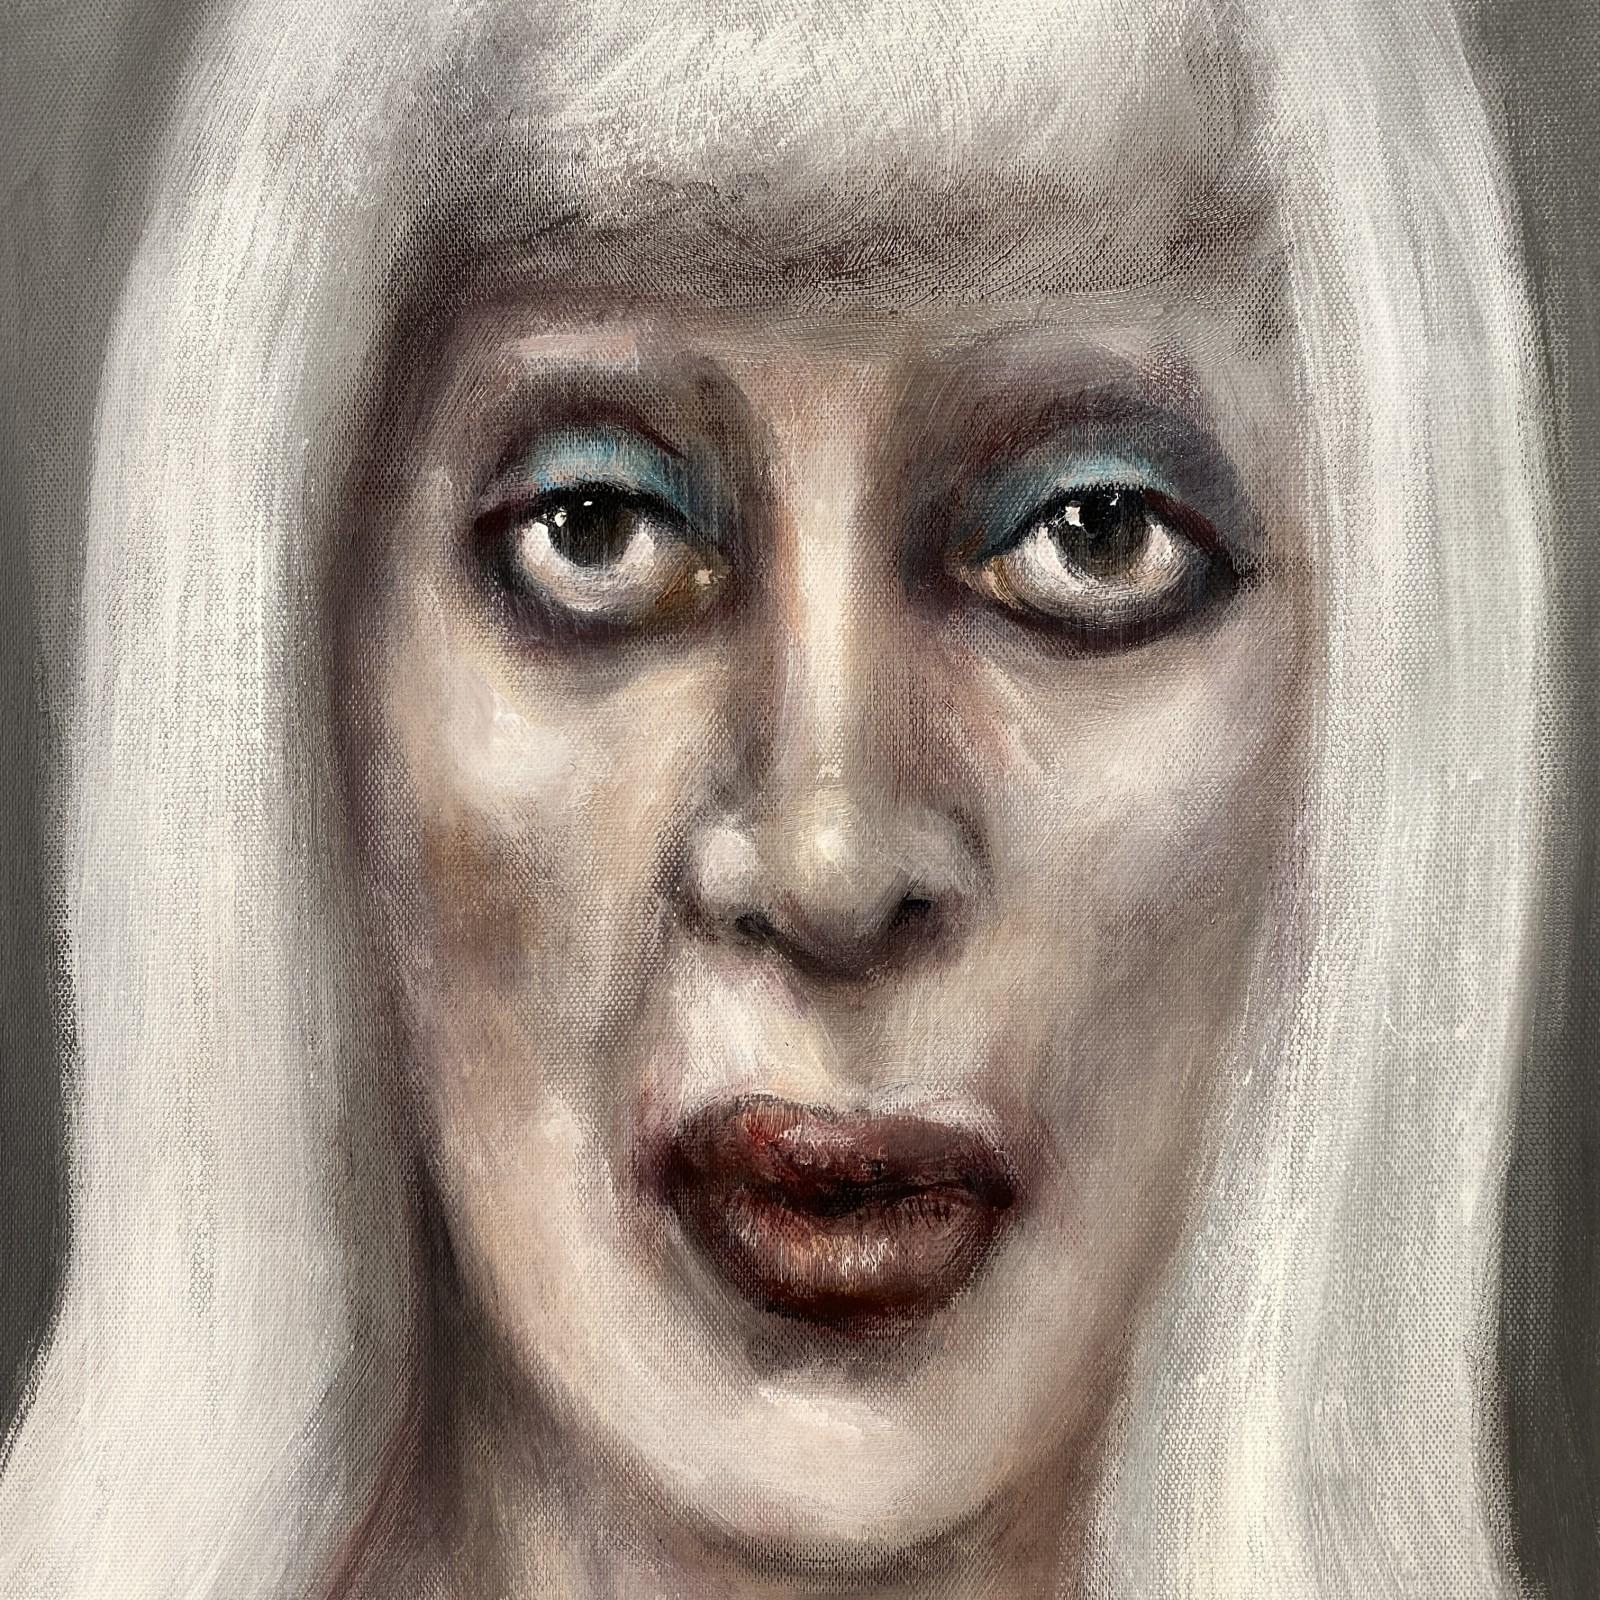 'green eyeshadow' by dorien...